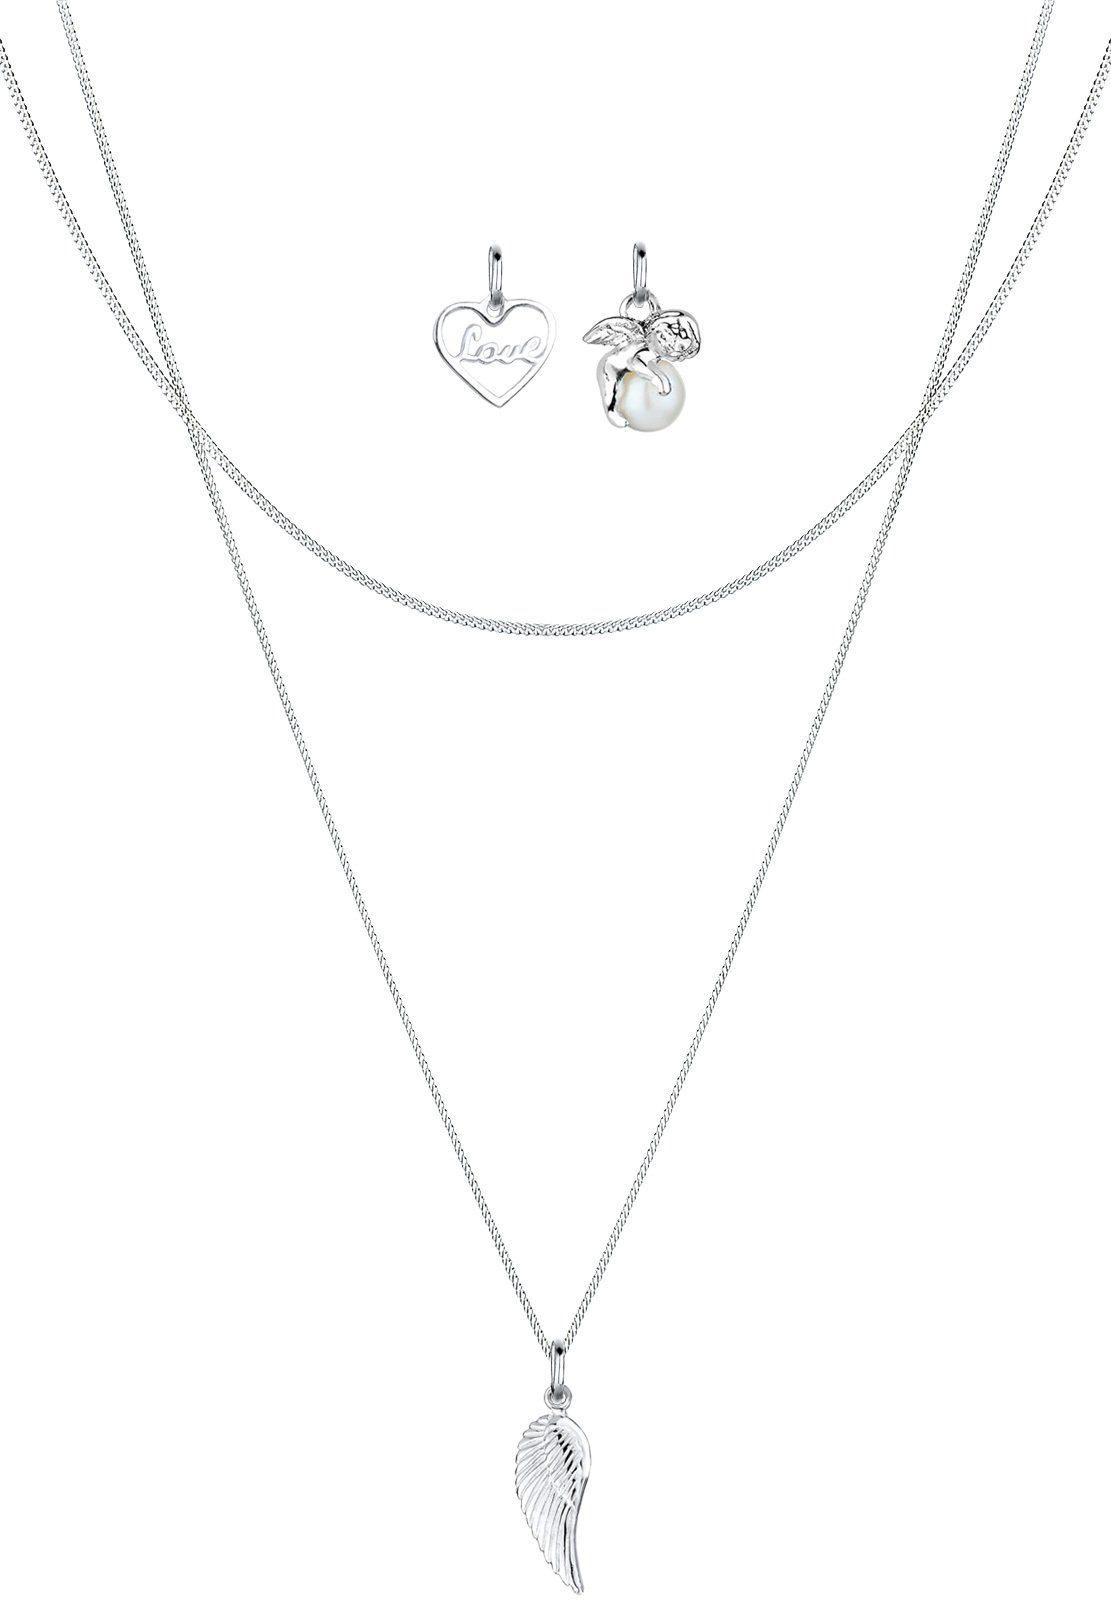 Elli Perlenketten-Set Anhänger-Set Herz Engel Flügel 925 Silber | Schmuck > Halsketten > Perlenketten | Elli